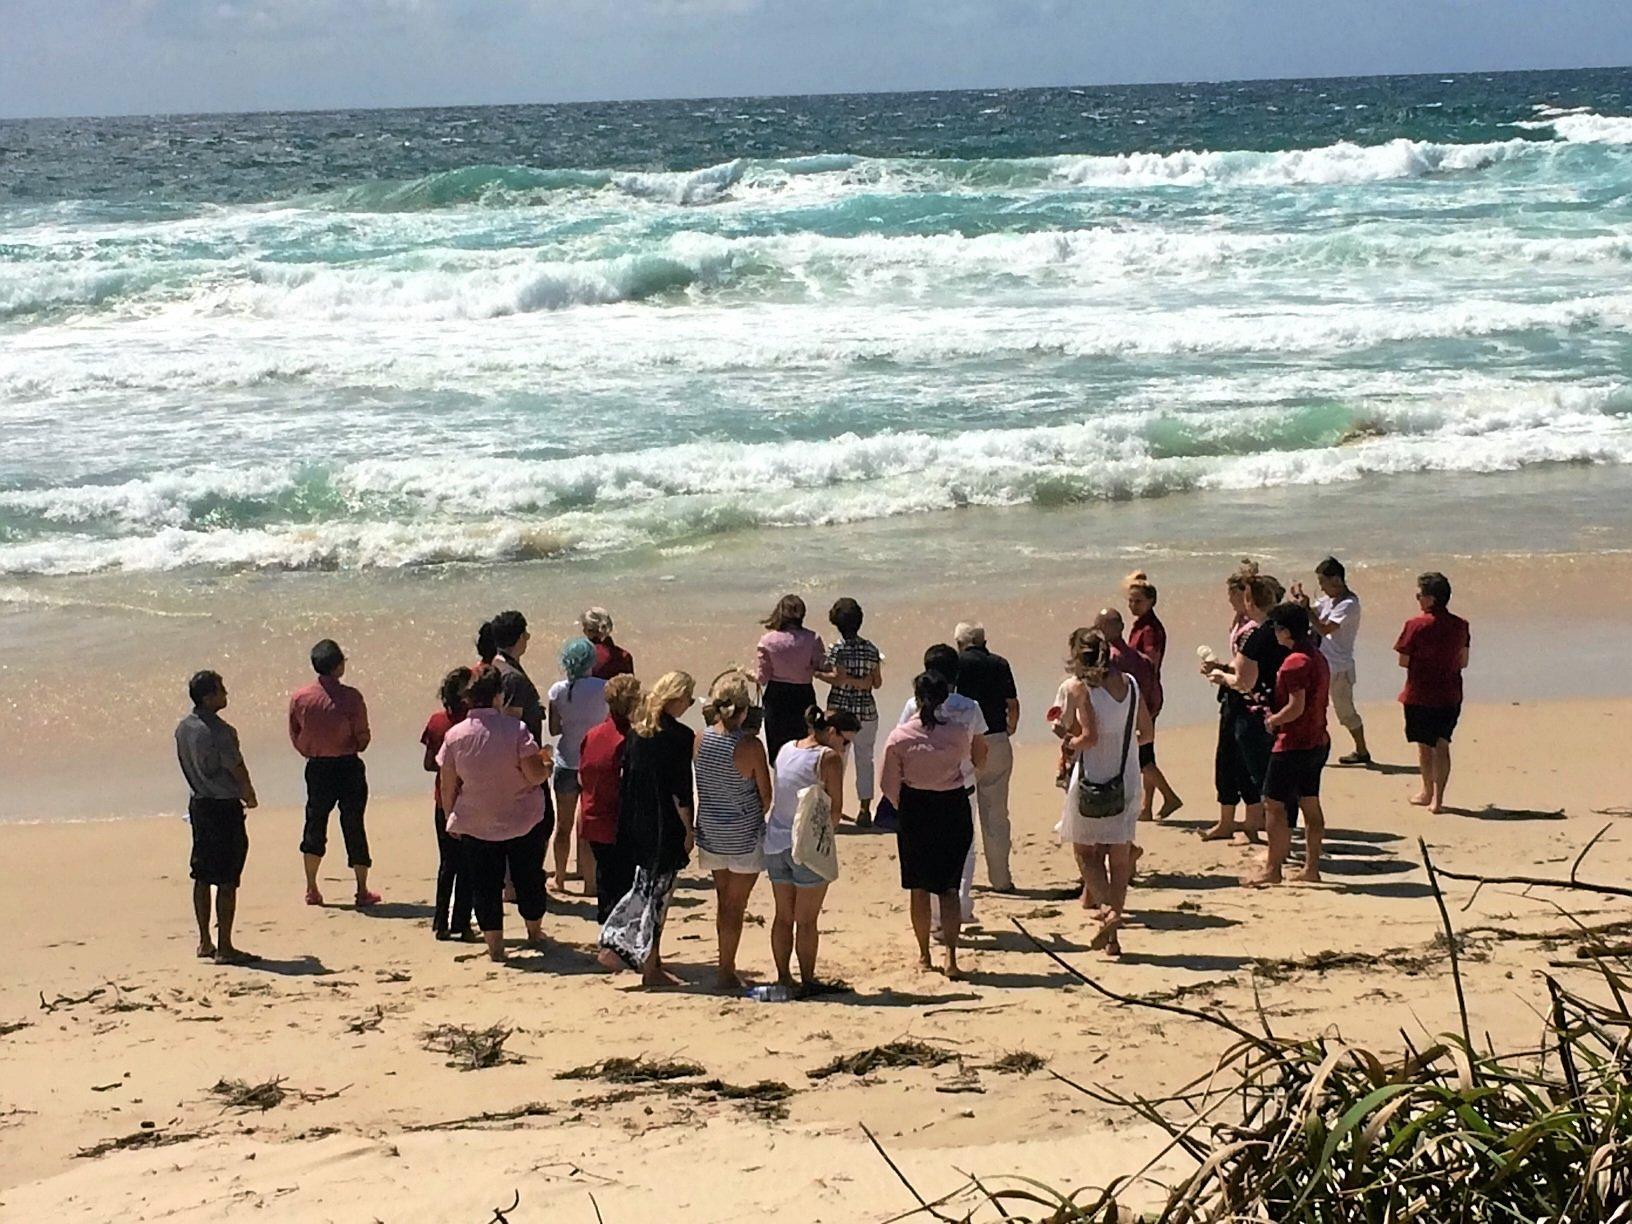 Staff of the Ramada Ballina and Tadashi's family prepare to throw flowers to the ocean to celebrate Tadashi's memory